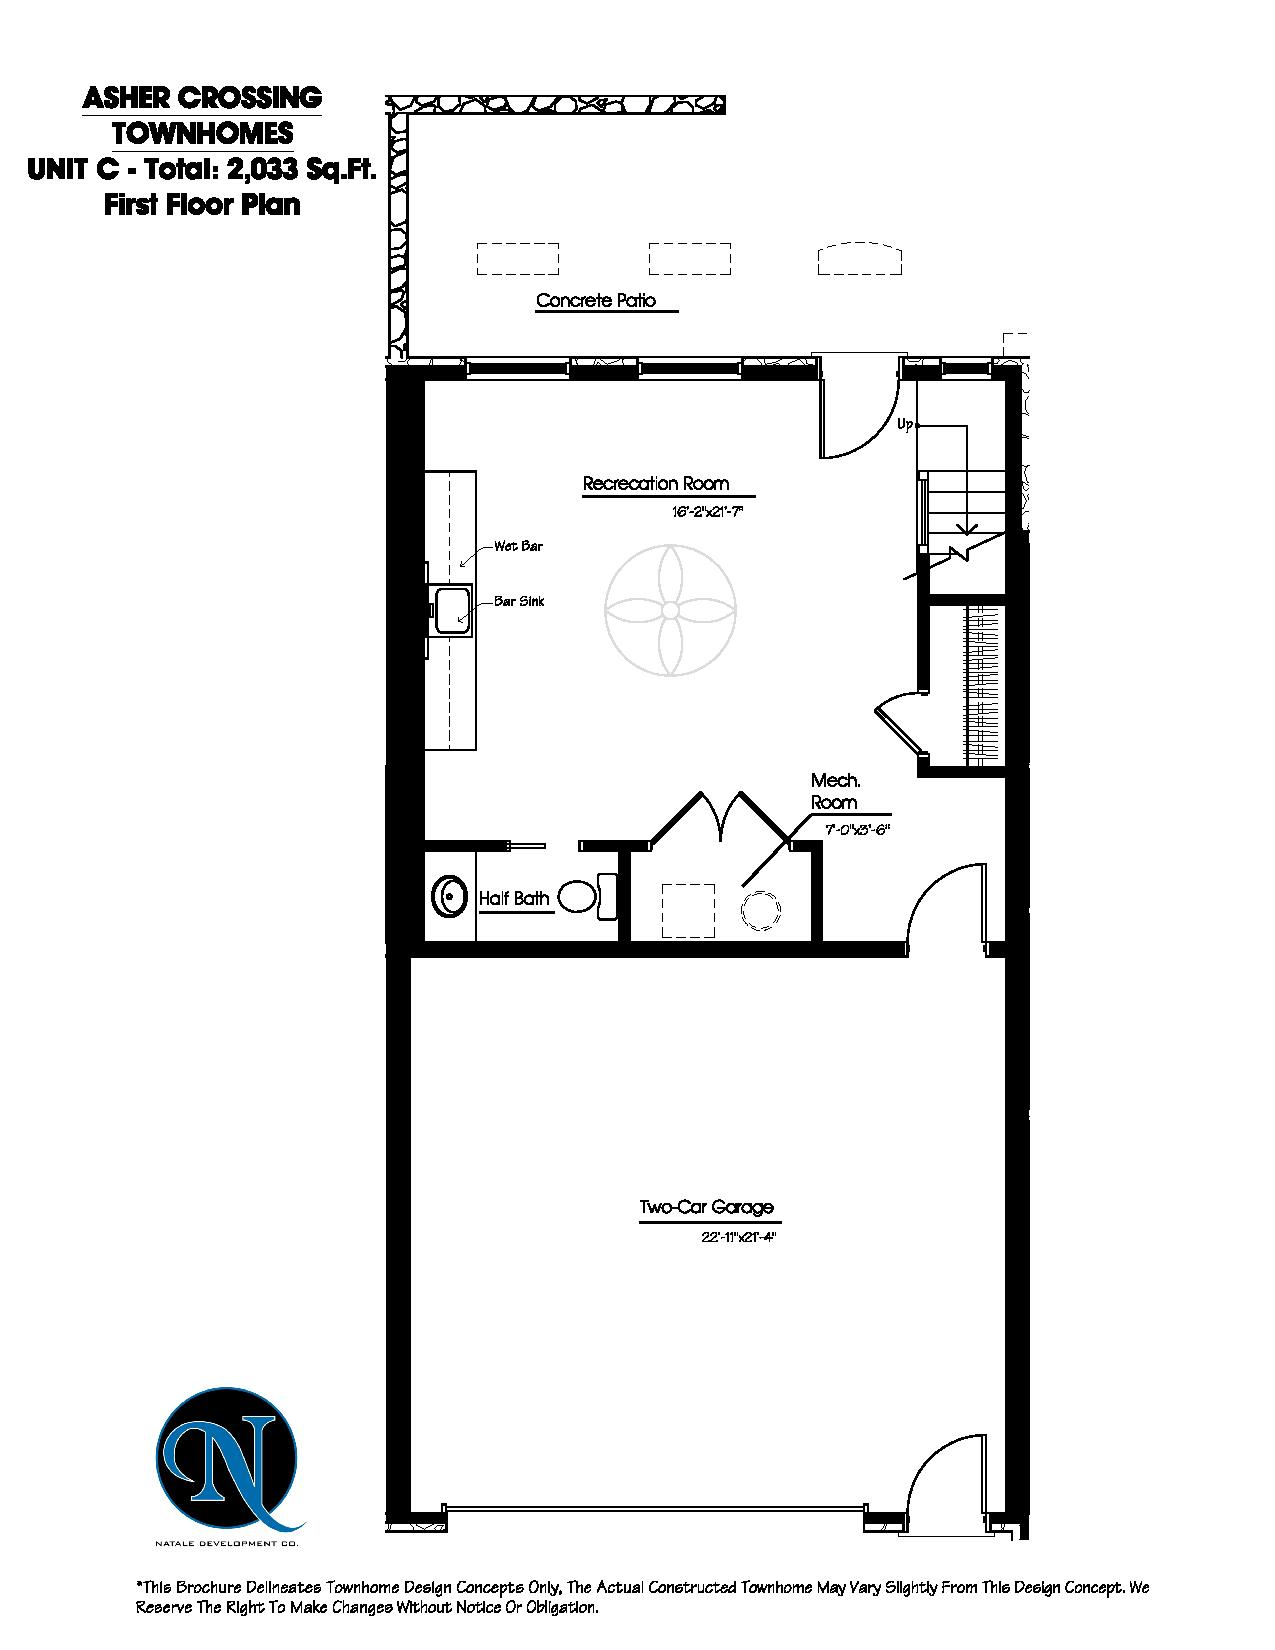 Asher crossing floor plans Unit c